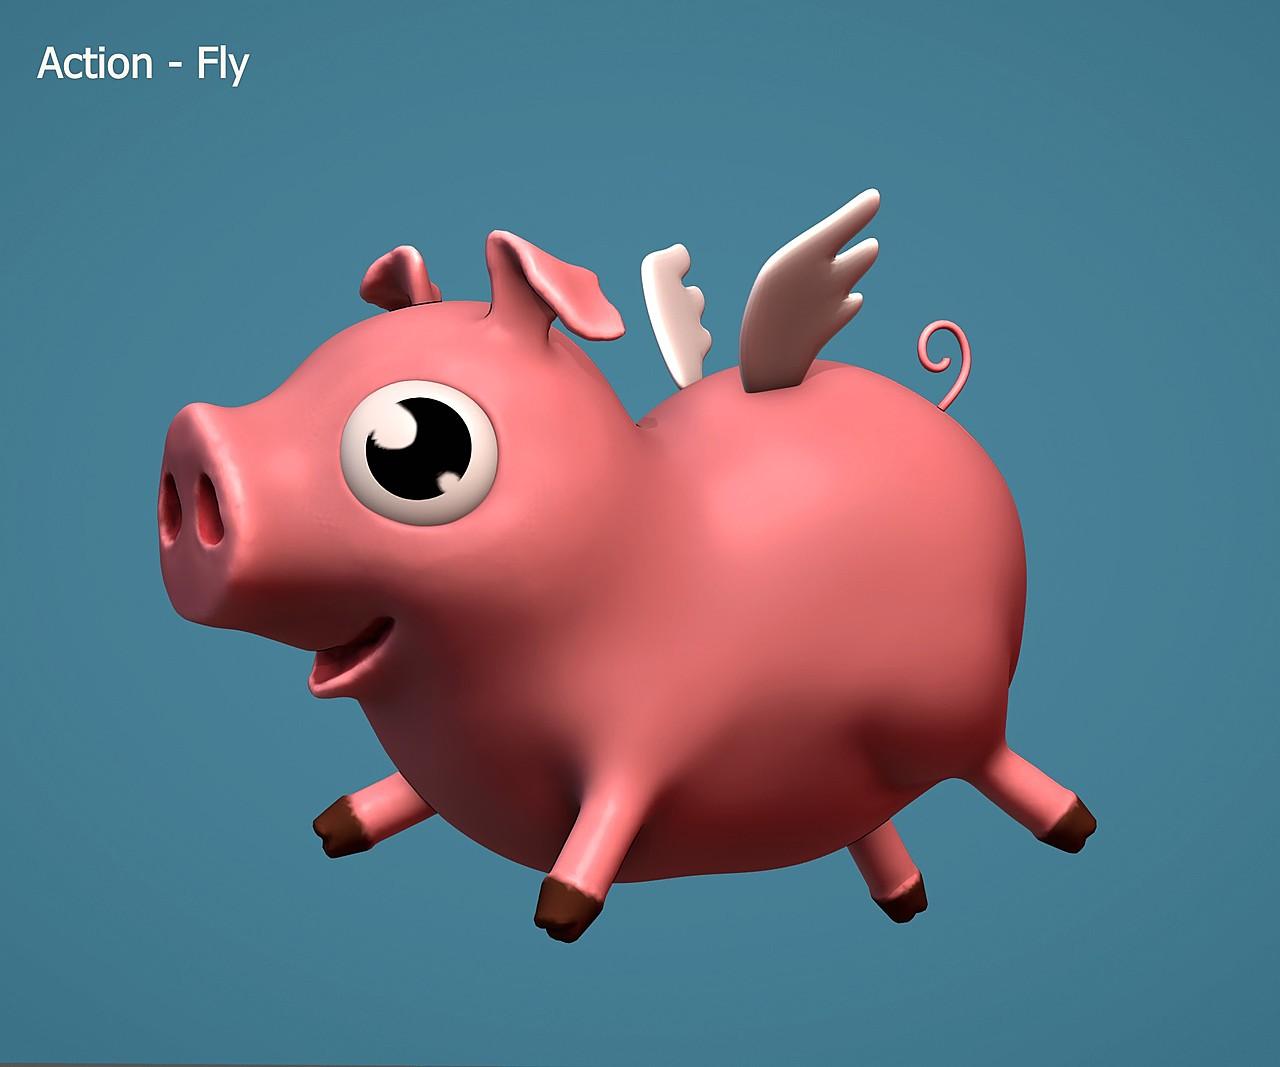 Flying pig - SculptJanuary2020, day 17